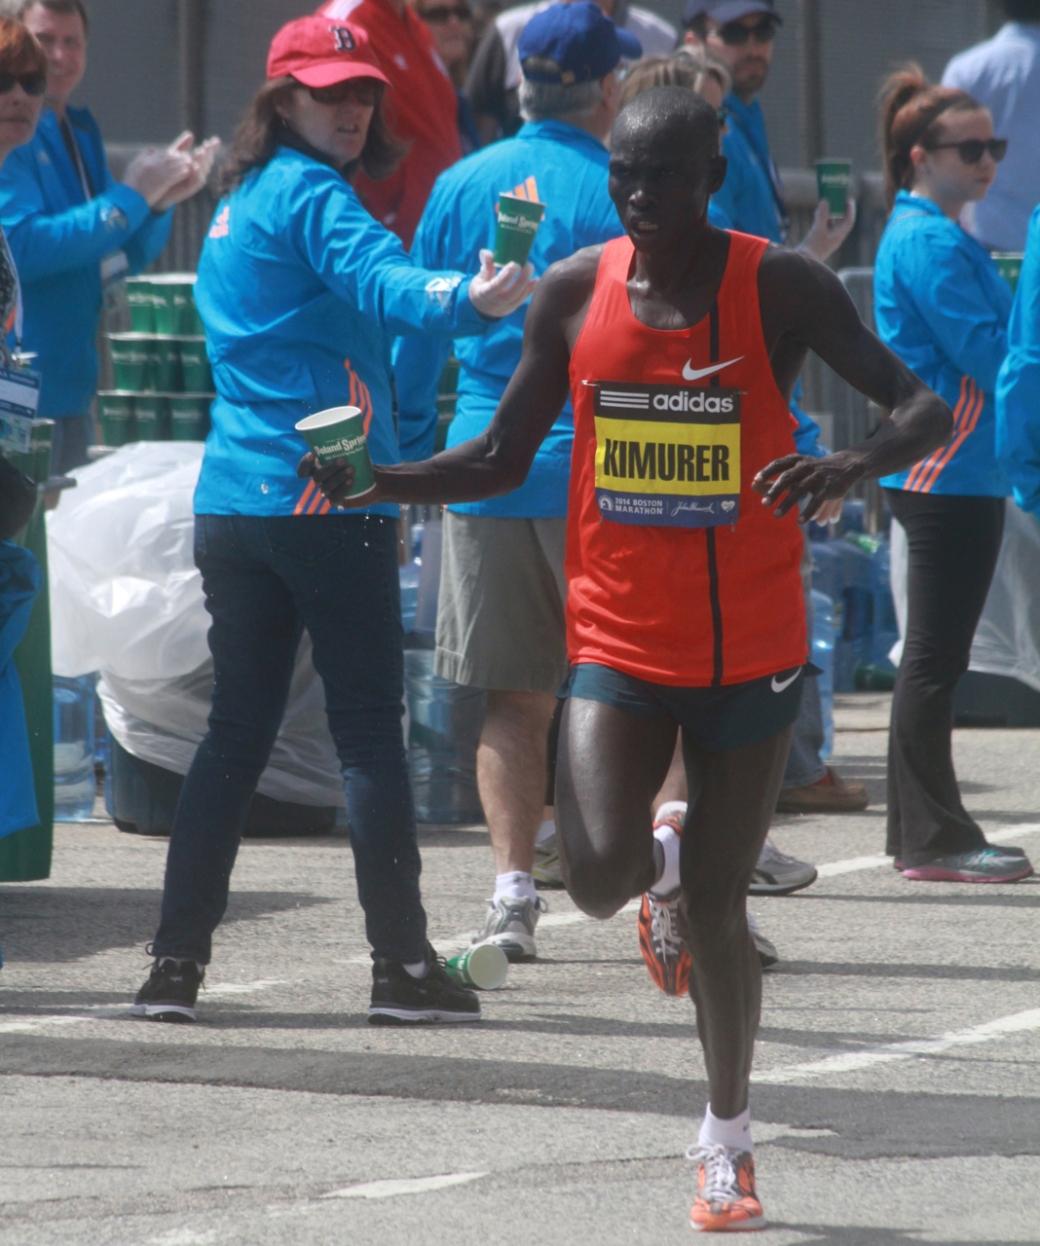 boston marathon april 21 beacon street elite runners joel kimurer